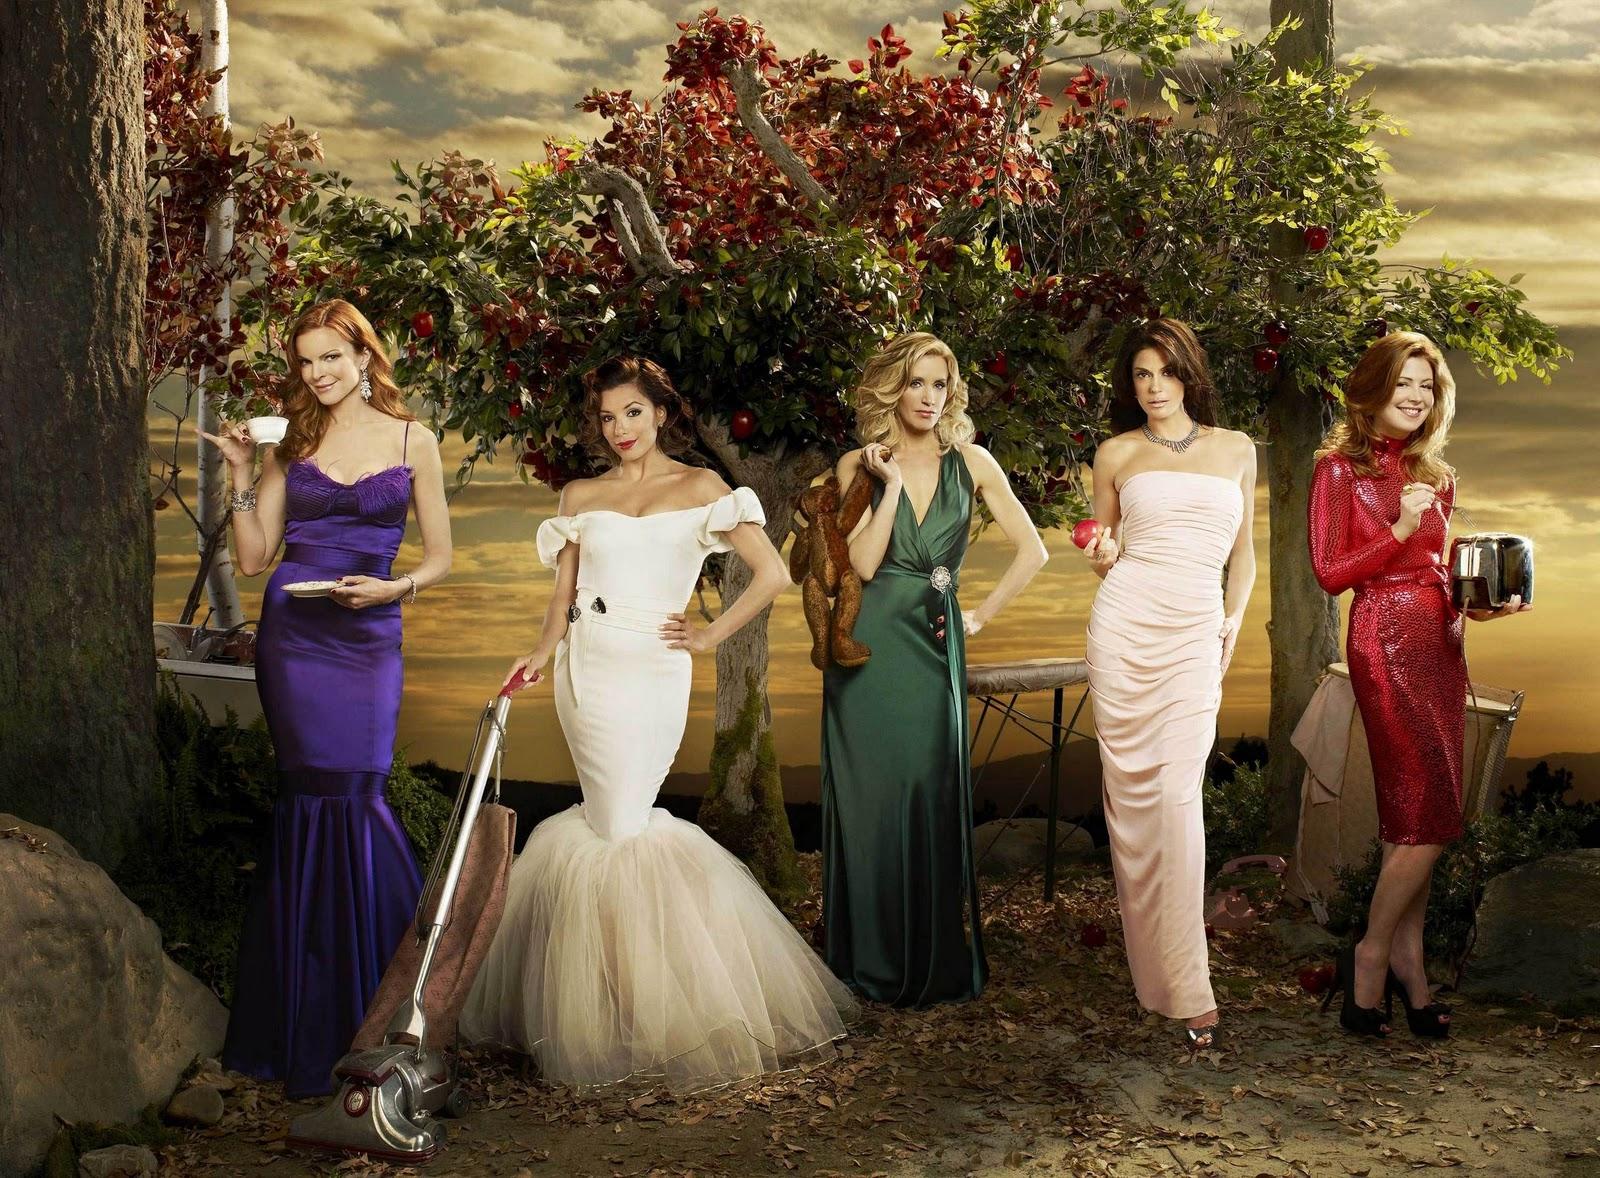 http://4.bp.blogspot.com/-u7hCuNKIbmQ/TZHTh0x-VKI/AAAAAAAABYk/NVJKT_9vxcw/s1600/desperate-housewives-season-6-promo-cast-pic-desperate-housewives-8023140-2560-1885.jpg